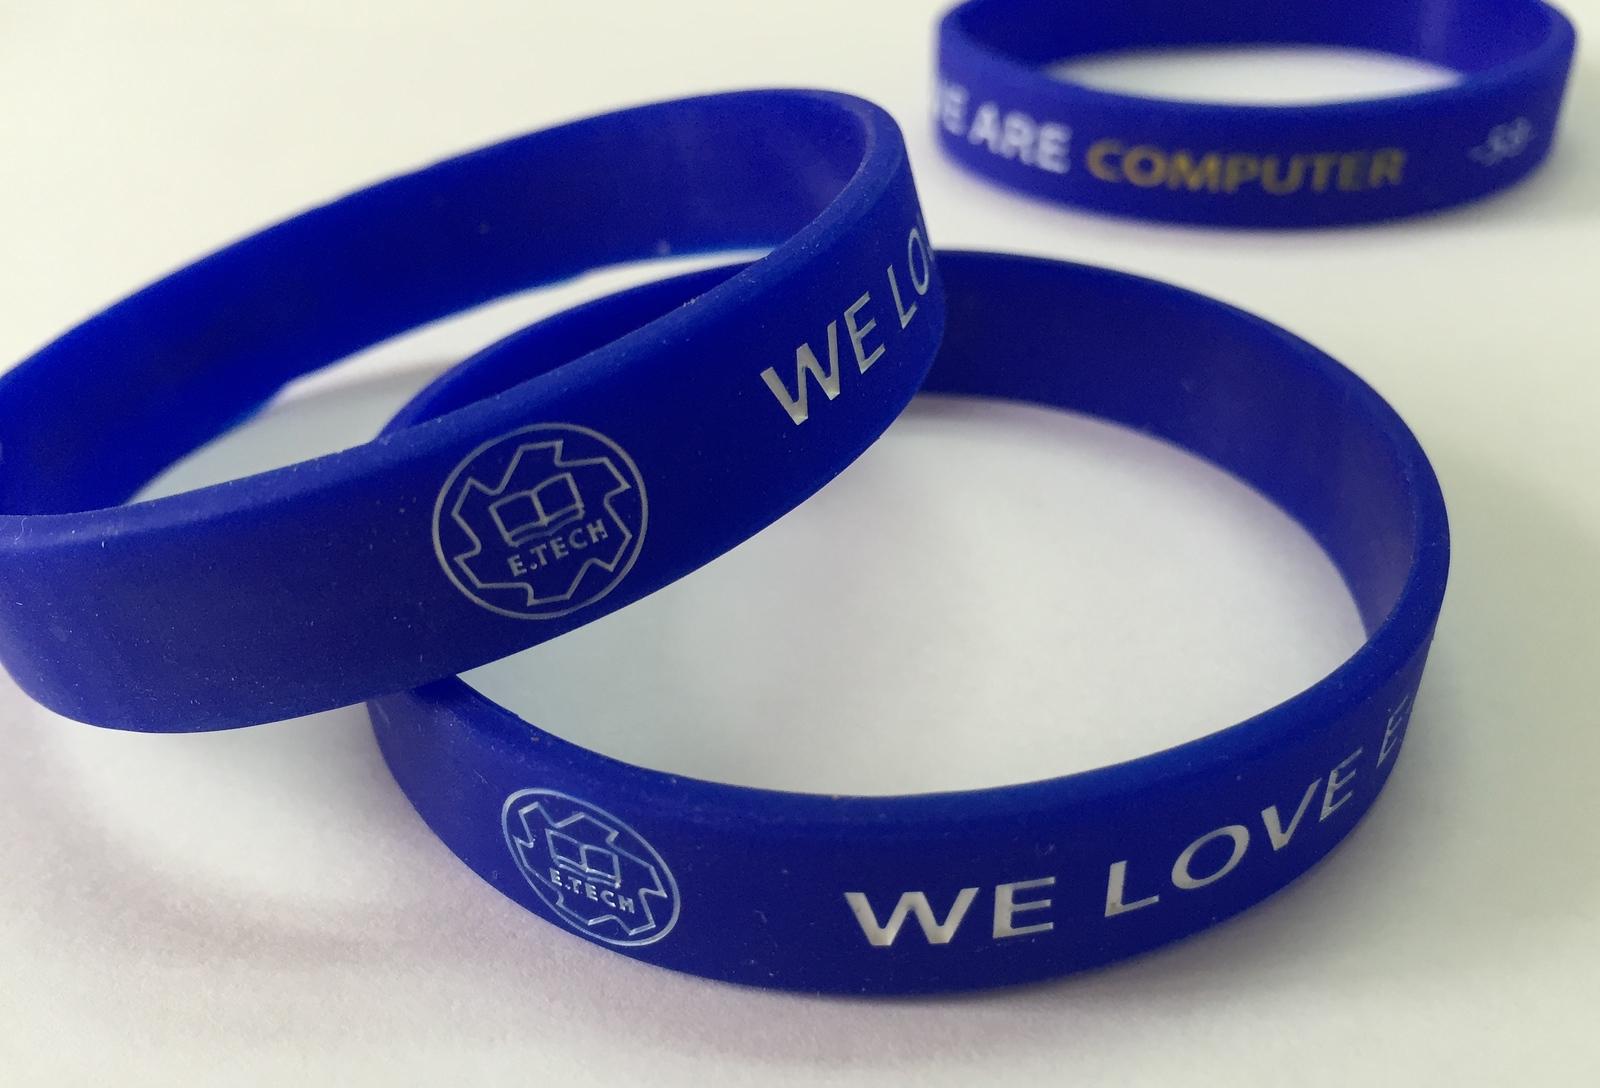 E.TECH WE LOVE ARE COMPUTER ริสแบนด์